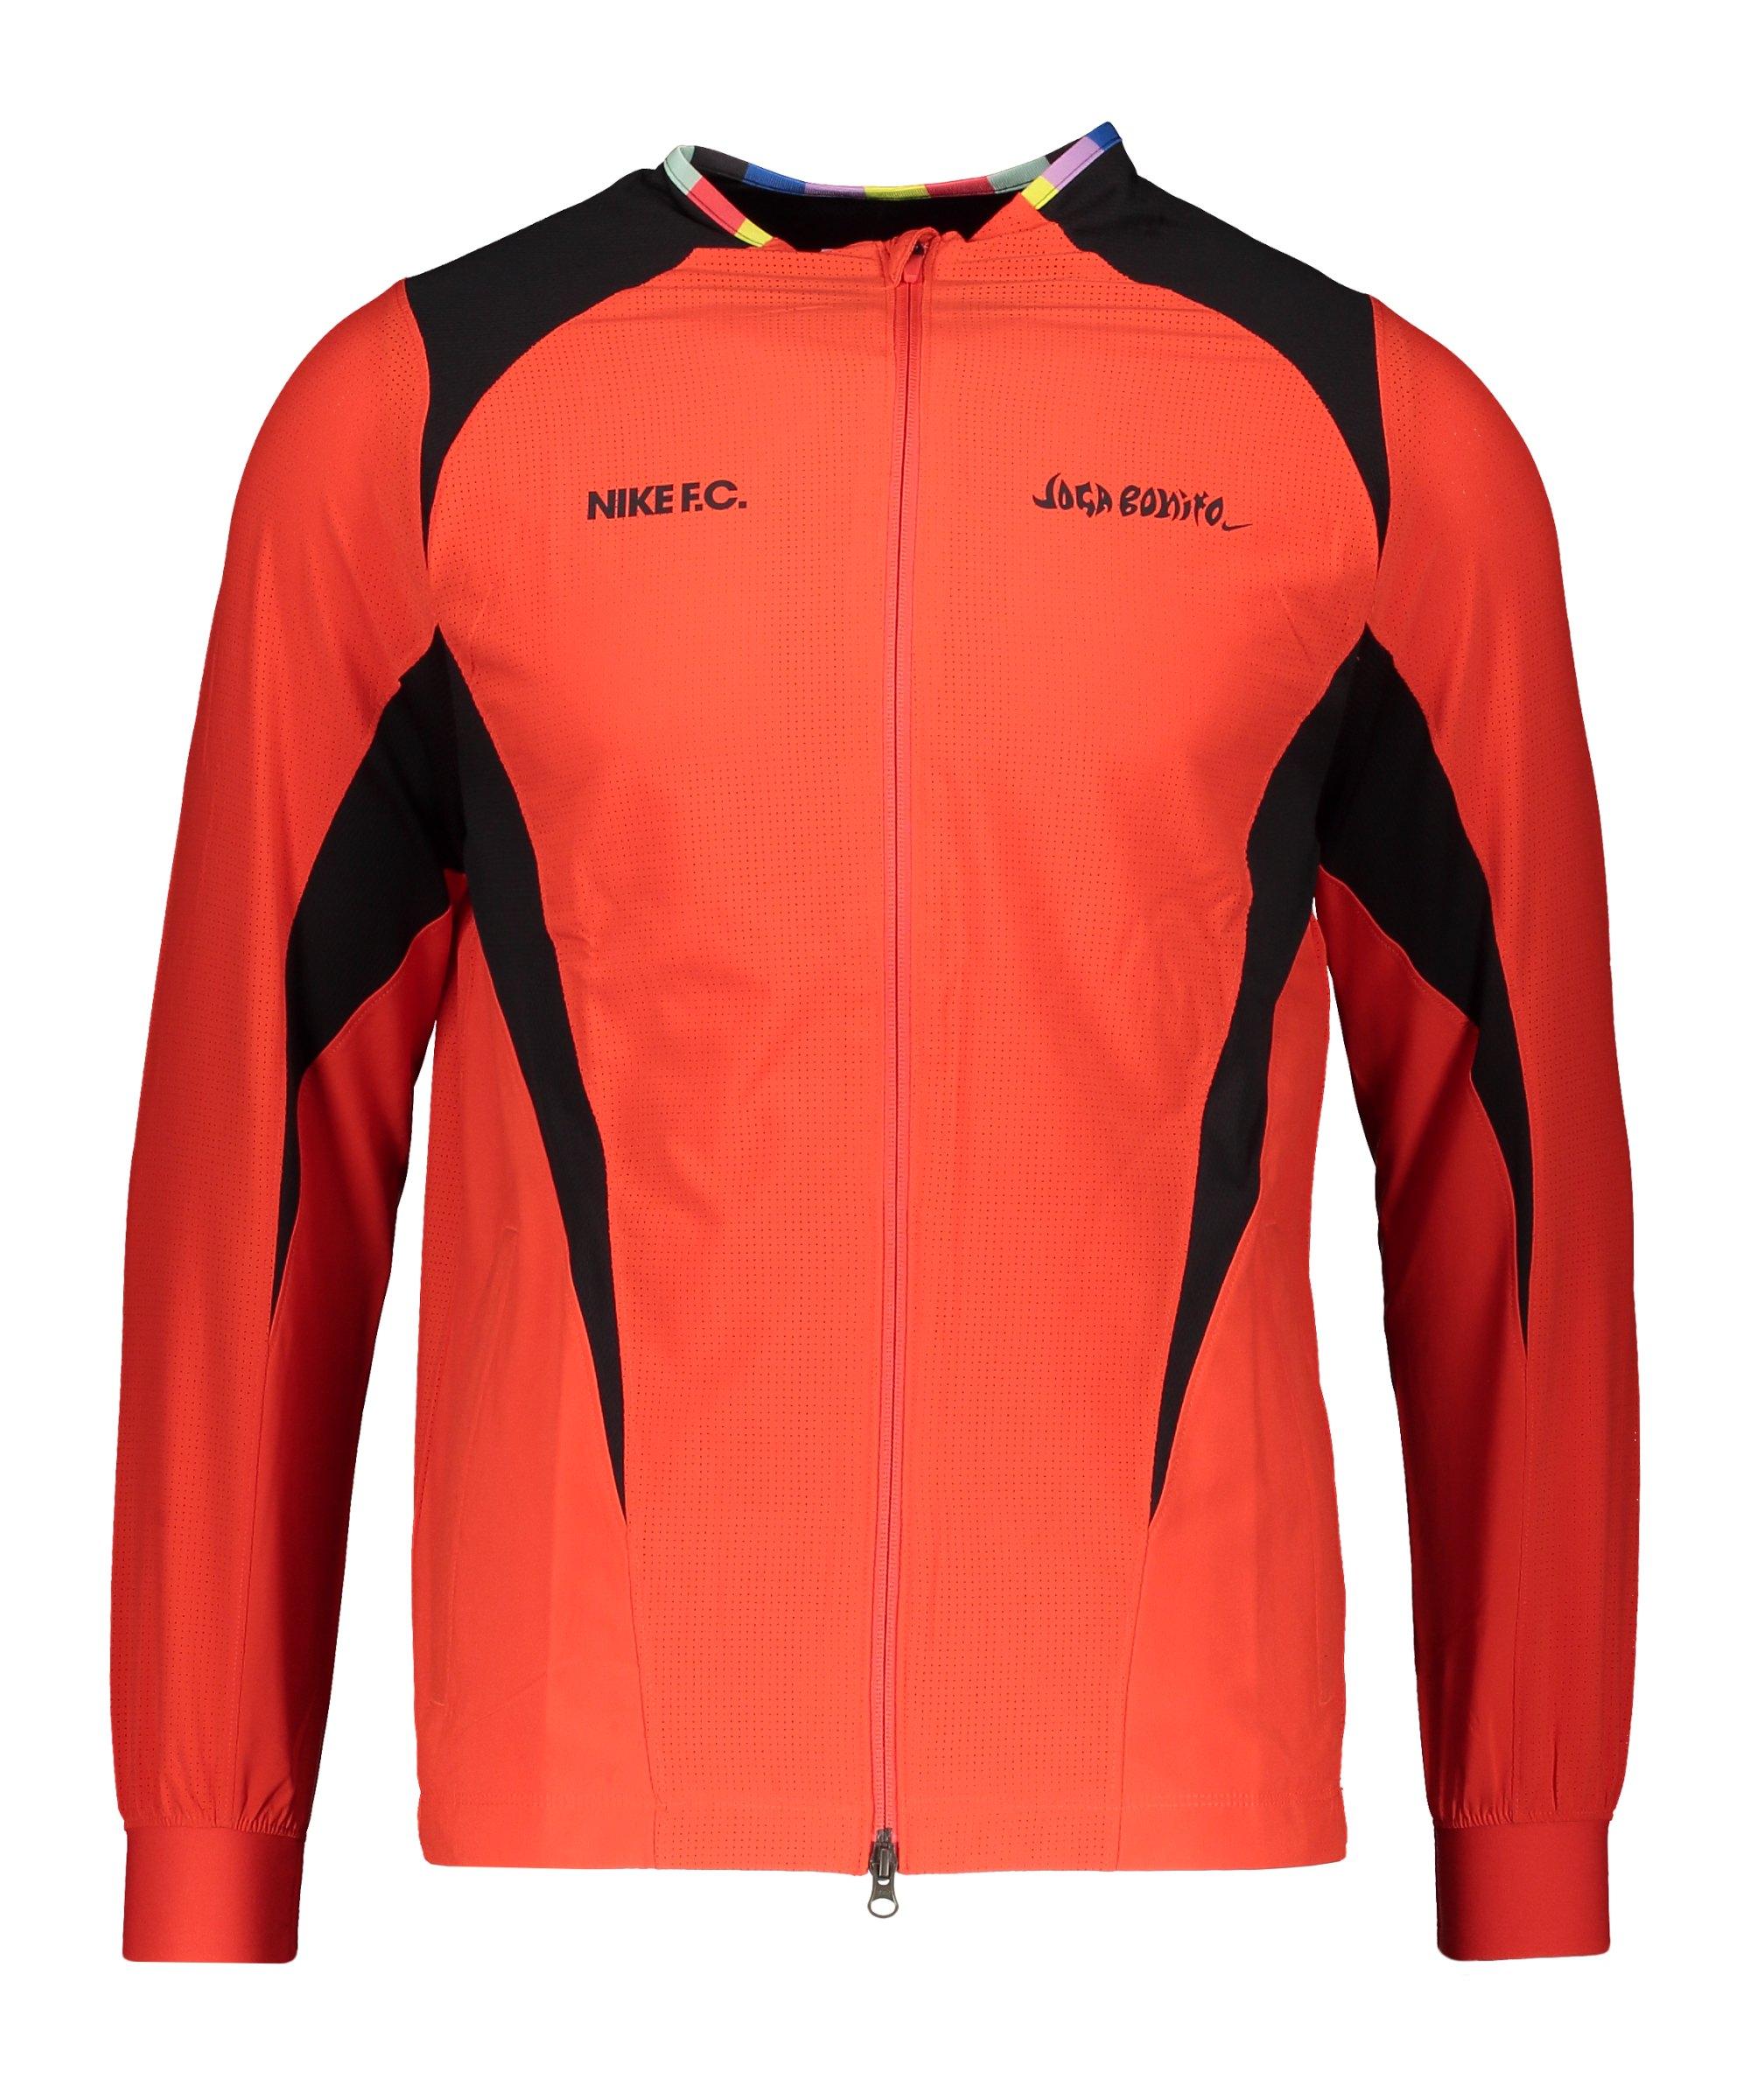 Nike F.C. Joga Bonito Woven Jacke Rot F673 - rot